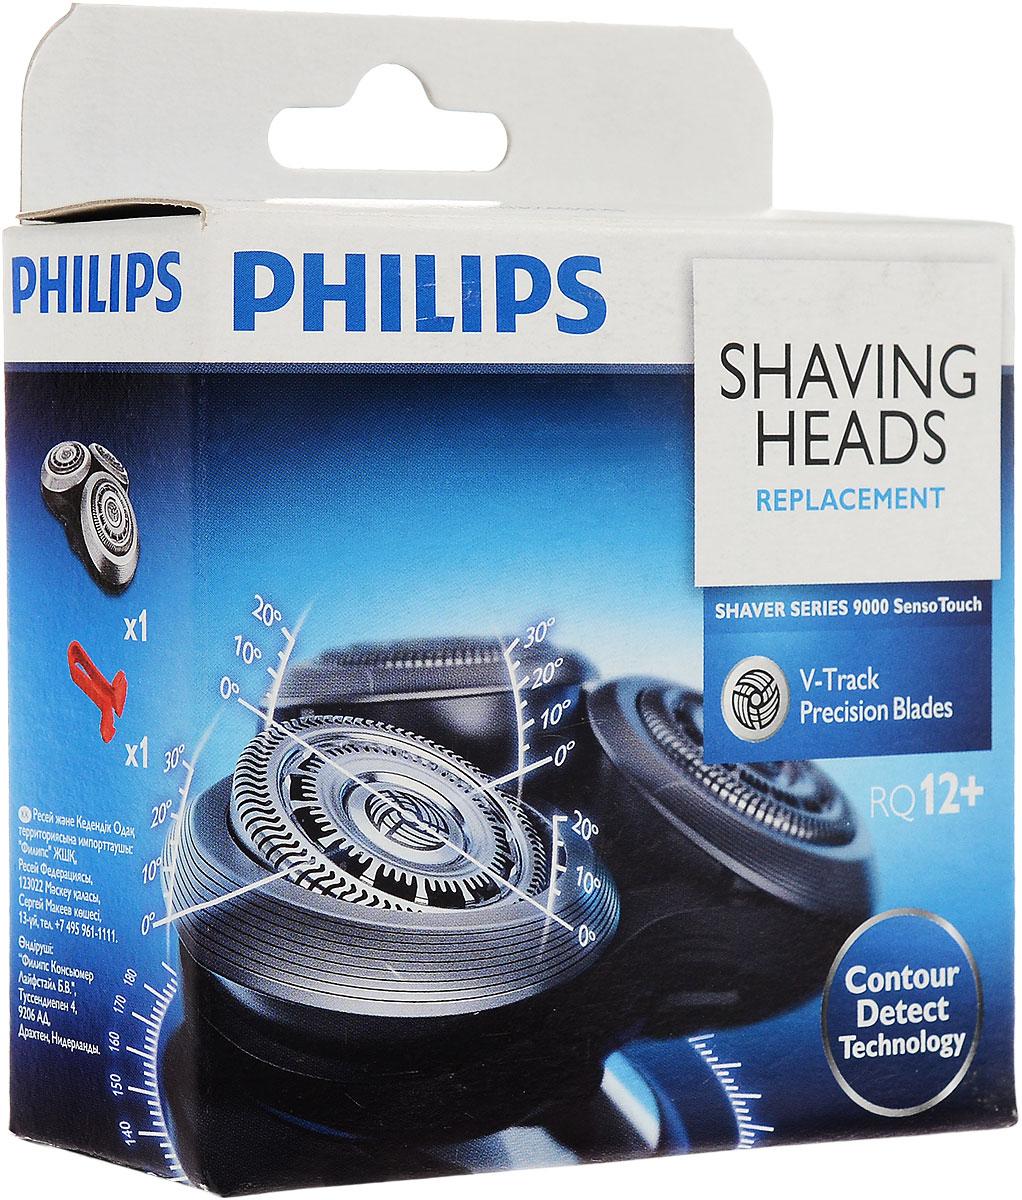 Philips RQ12/60 бритвенные головки для бритв серии 9000, Sensotouch 3D, ArcitecRQ12/60Philips RQ12/60 - сменная бритвенная головка для бритв серии 9000, Sensotouch 3D и Arcitec.